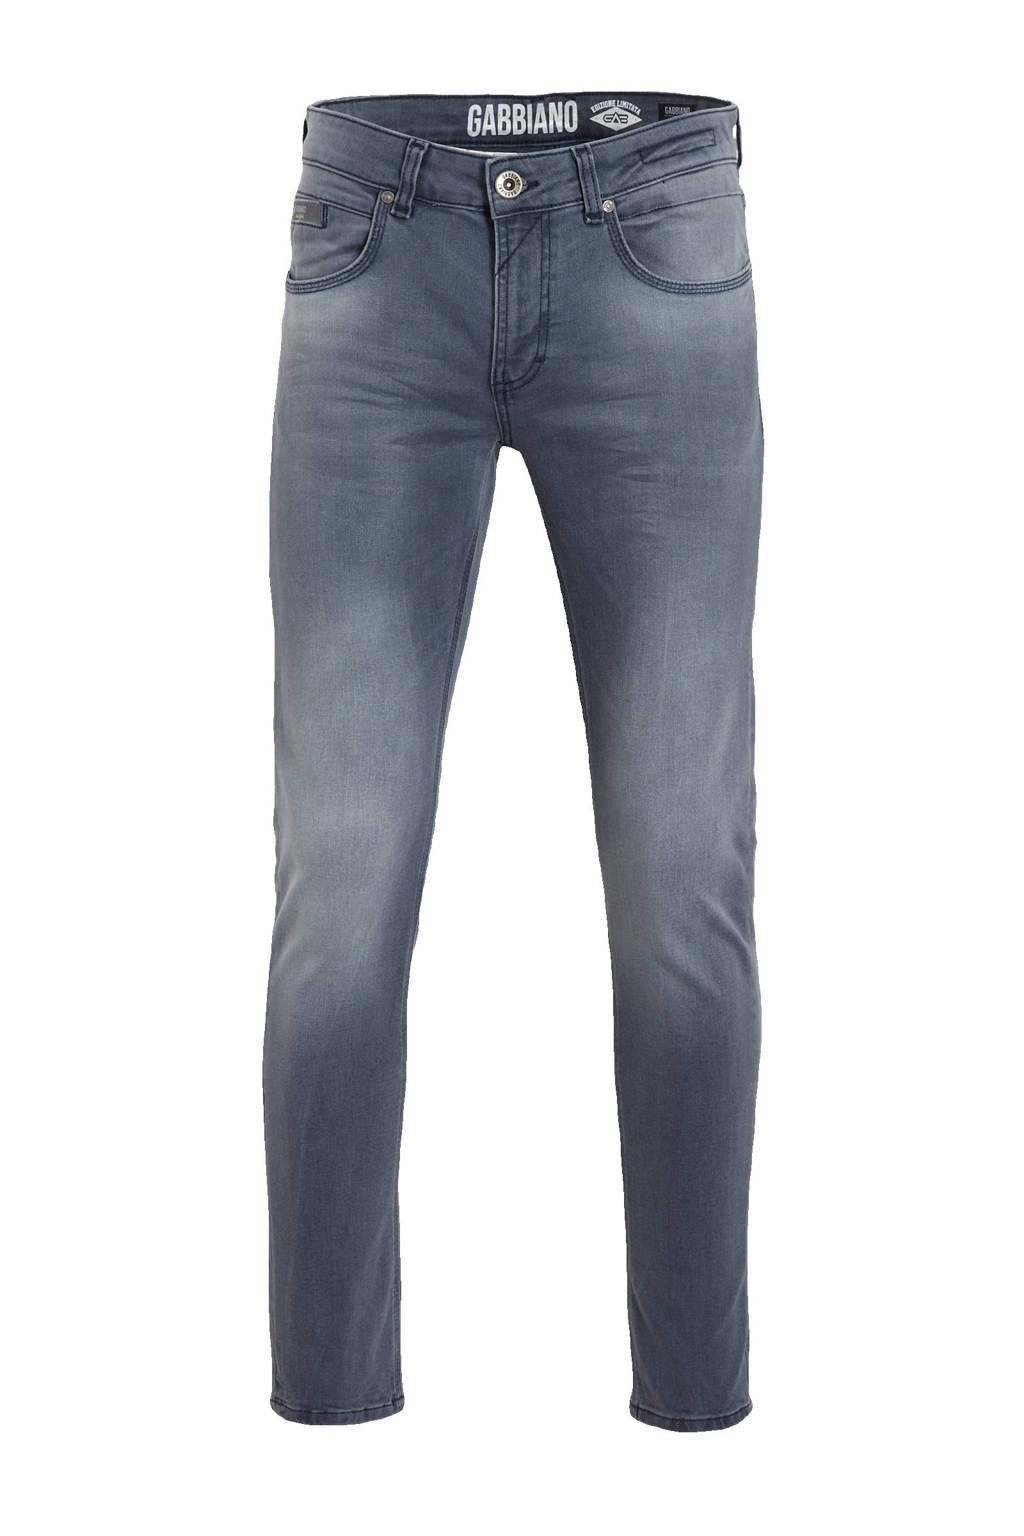 GABBIANO slim fit jeans torino, Torino